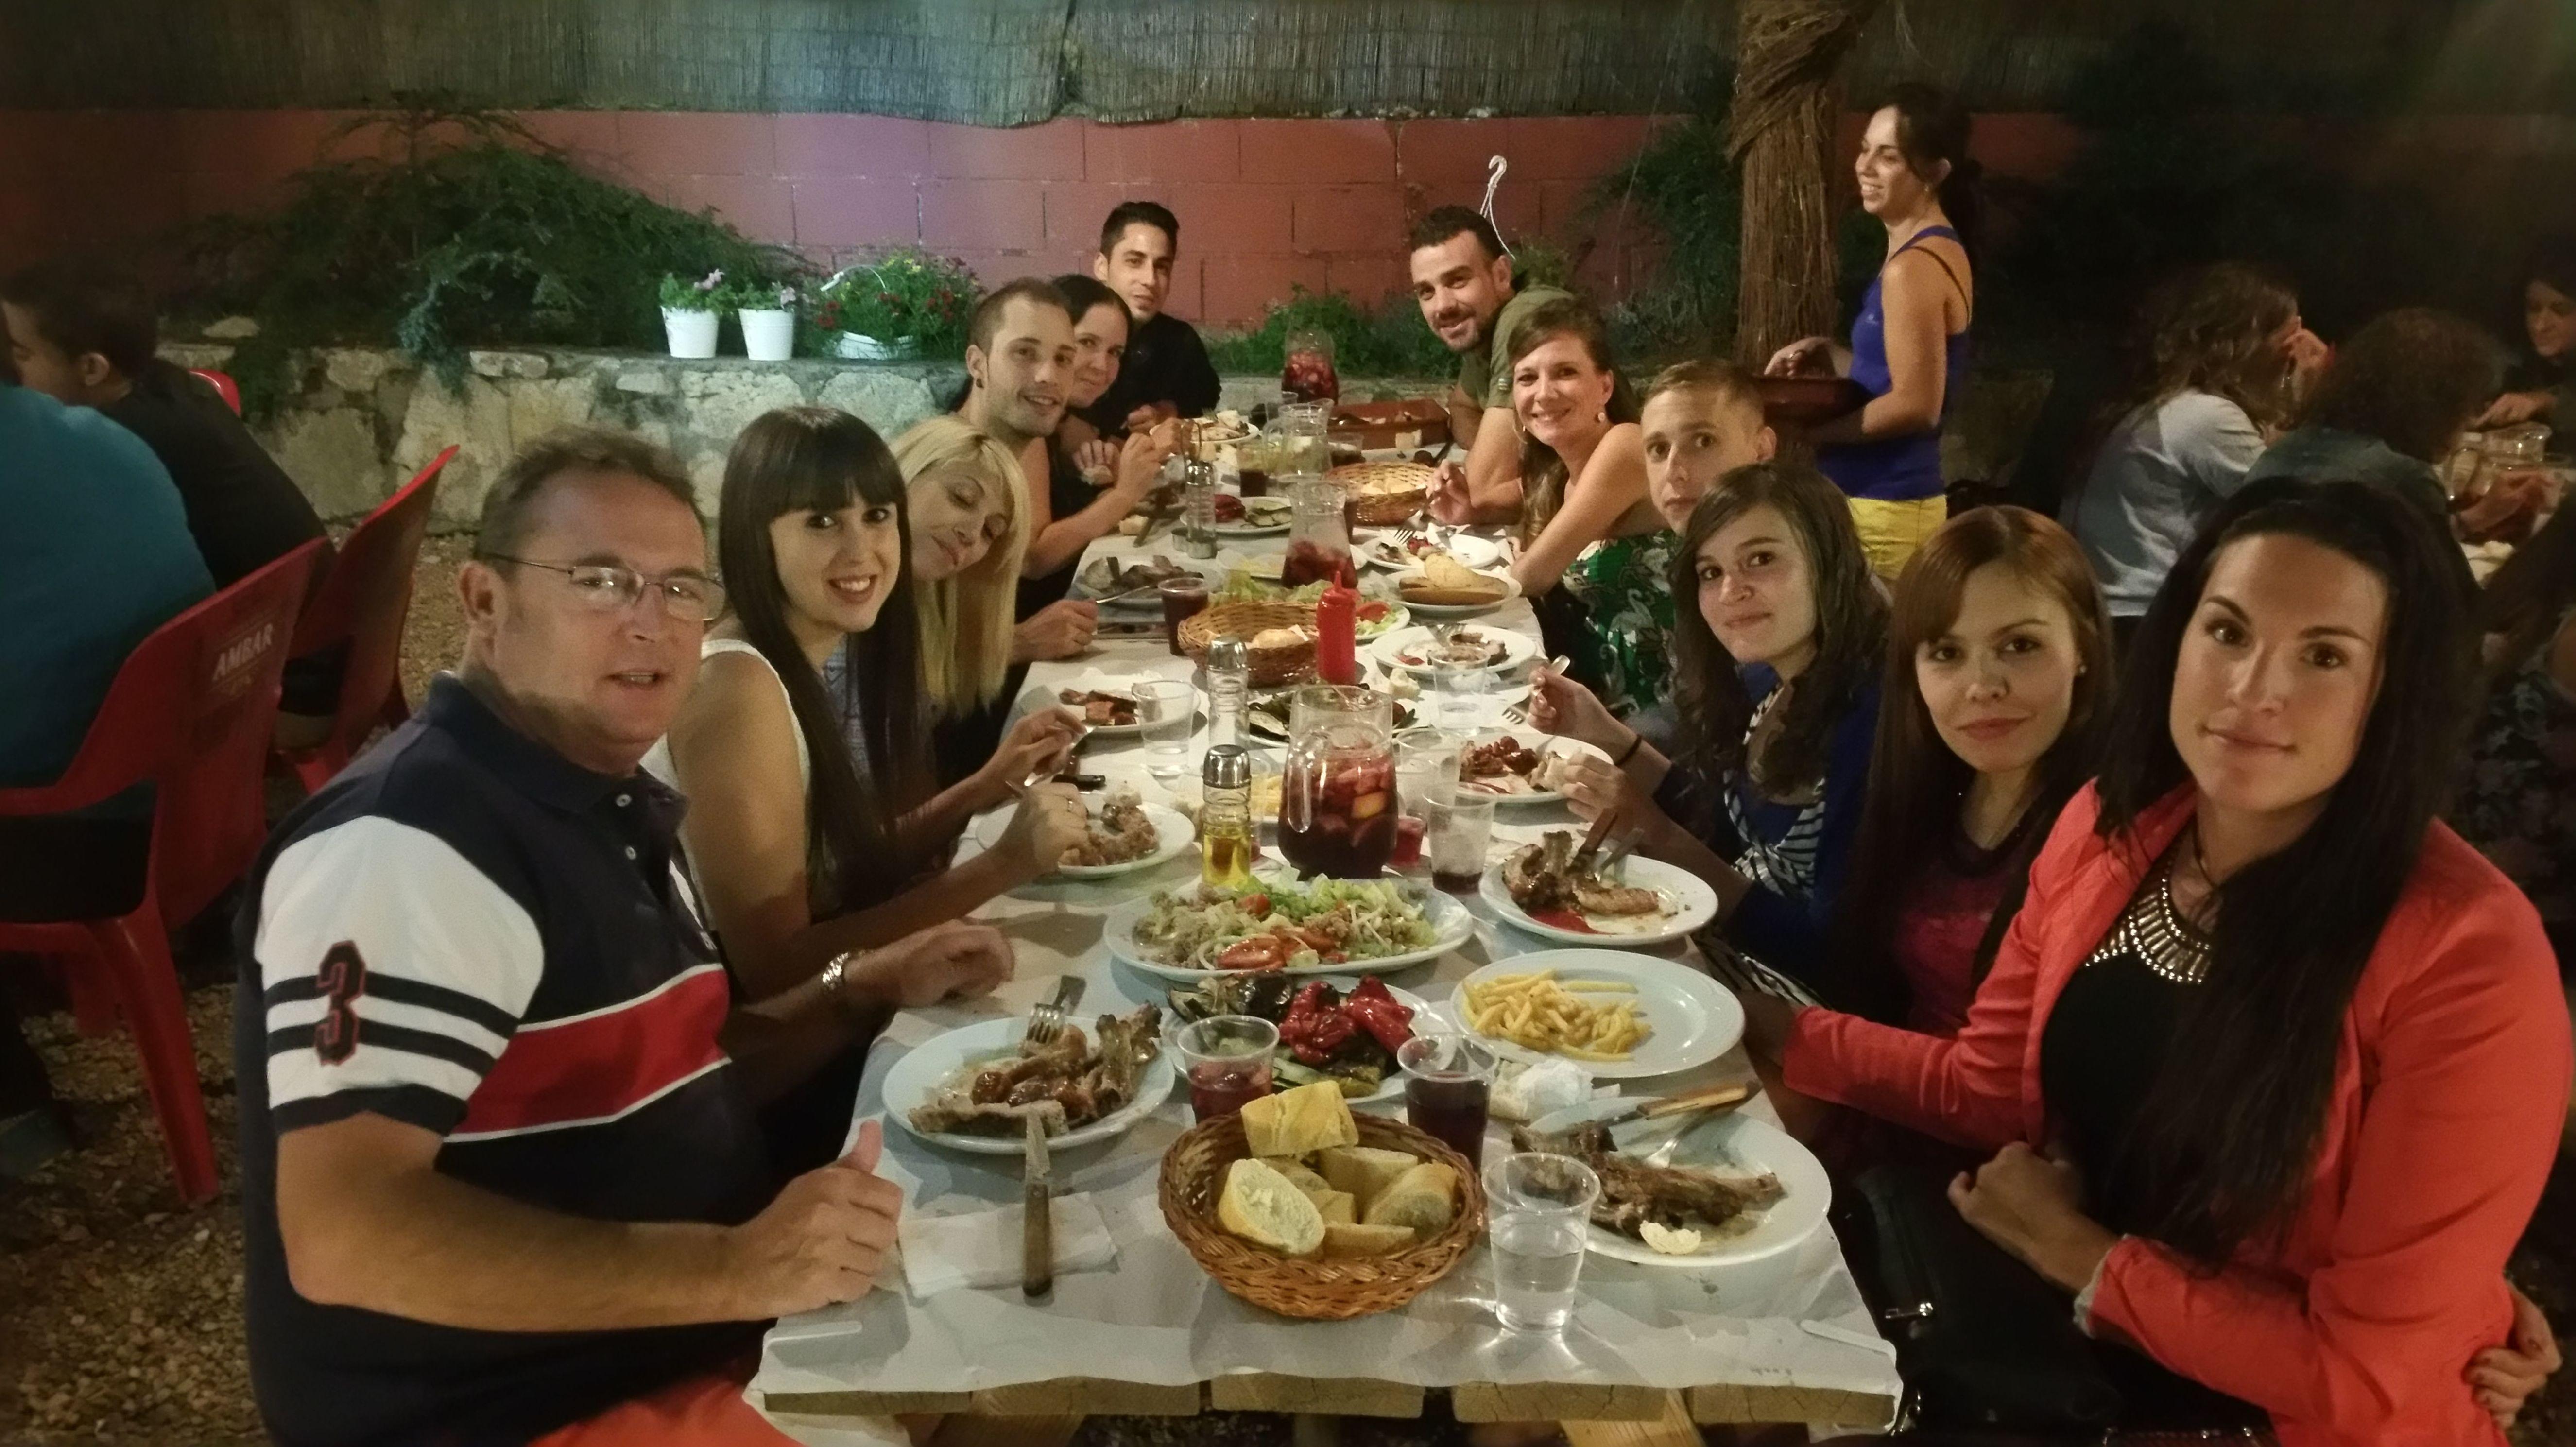 15 Diciembre  Cena Navidad de Socios.  : CALENDARIO DE ACTIVIDADES de Información